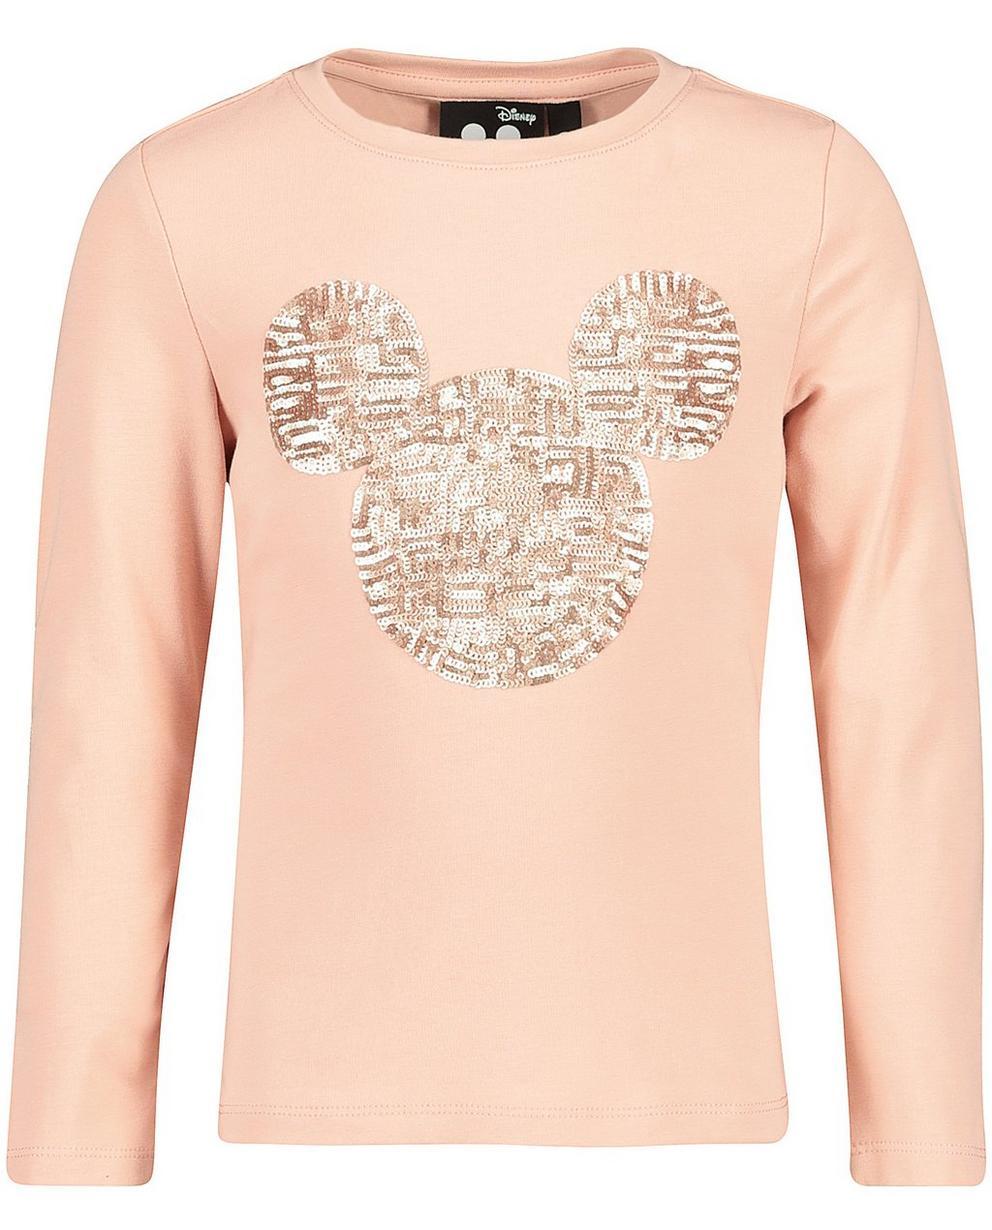 T-Shirts - Pink - Longsleeve mit Pailletten